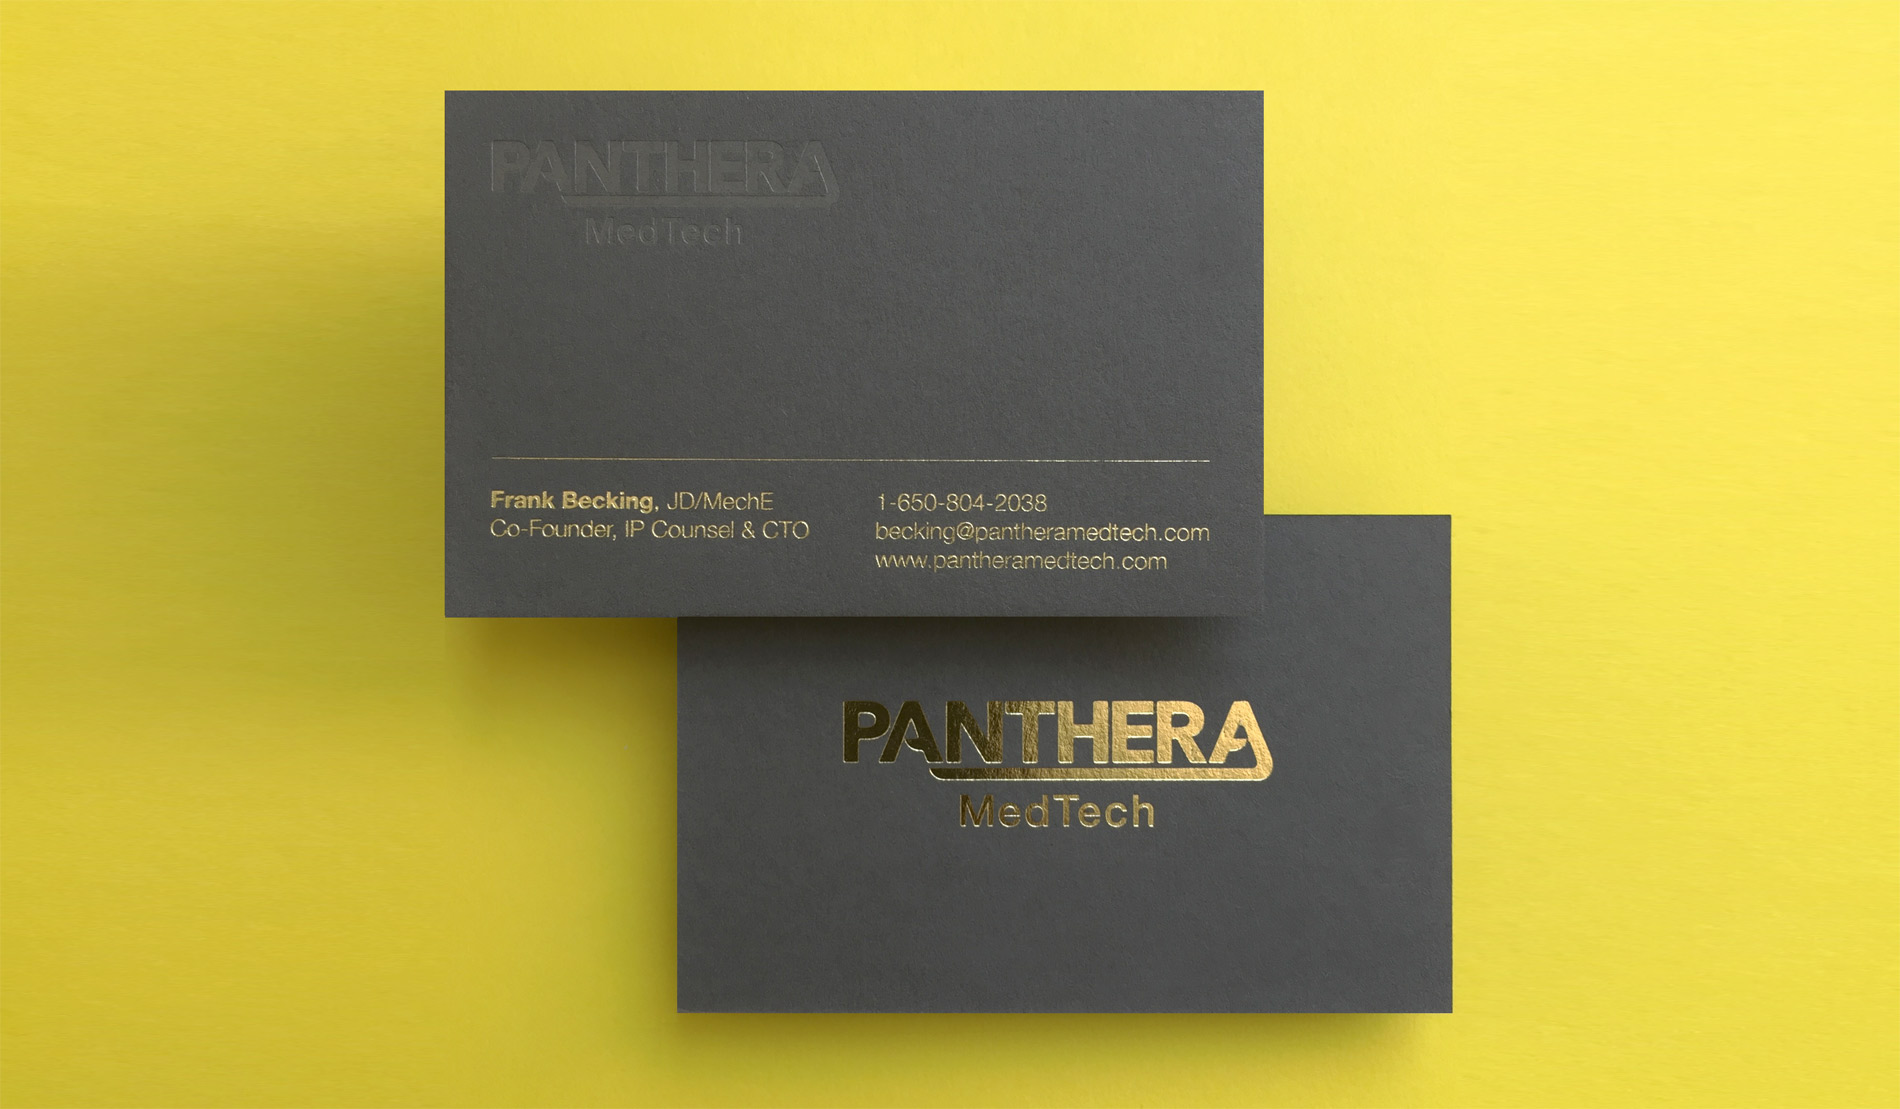 Panthera Med.Tech